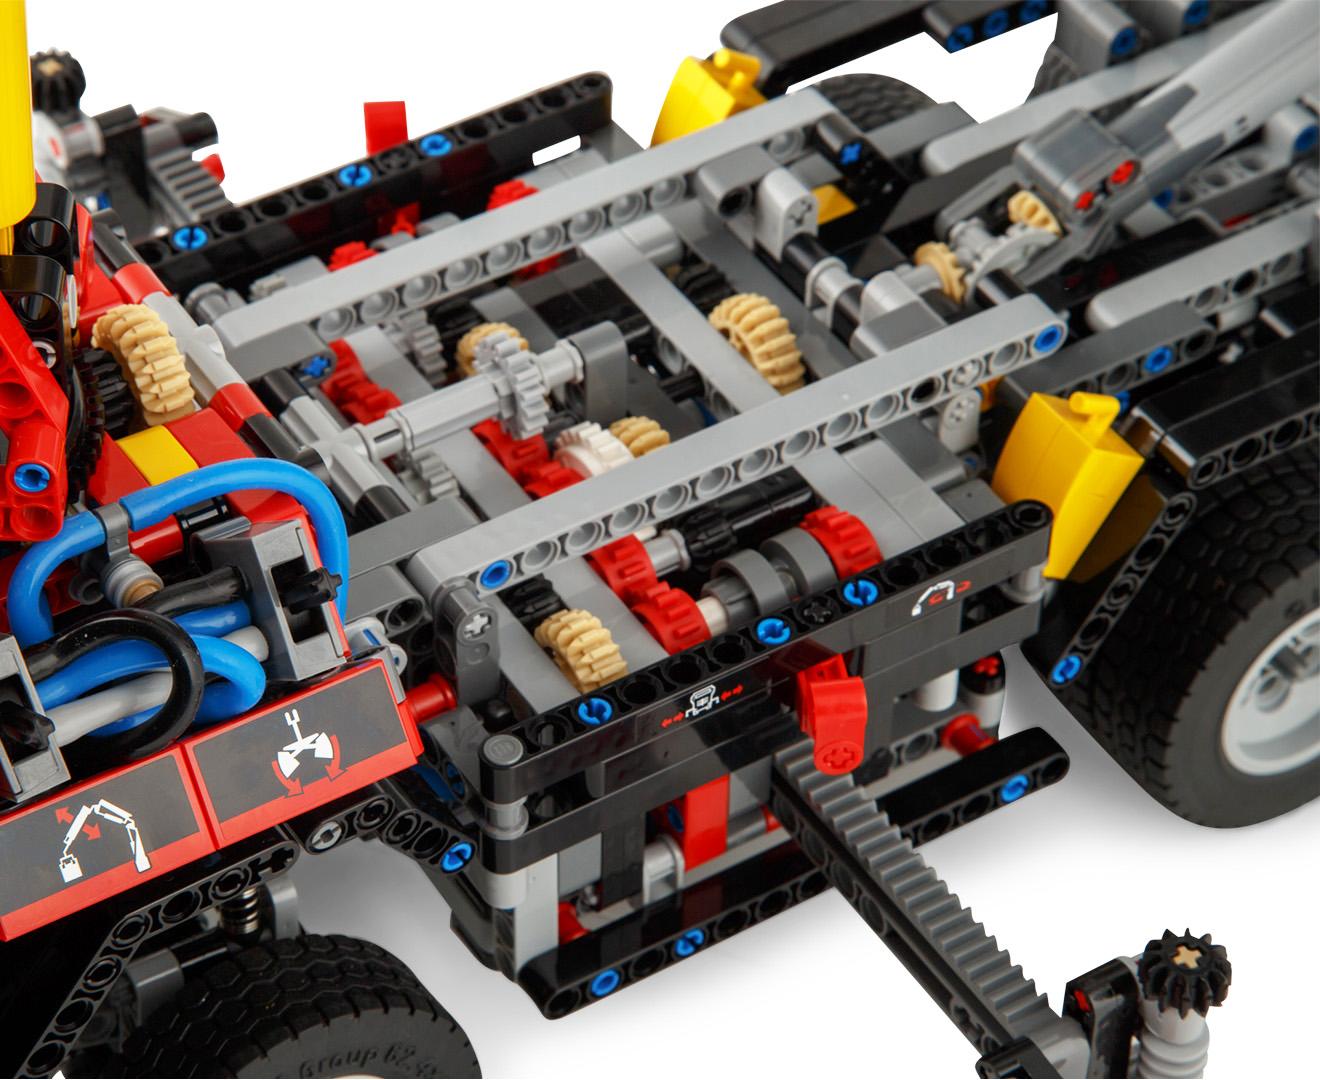 Lego technic mercedes benz arocs 3245 building set ebay for Lego mercedes benz